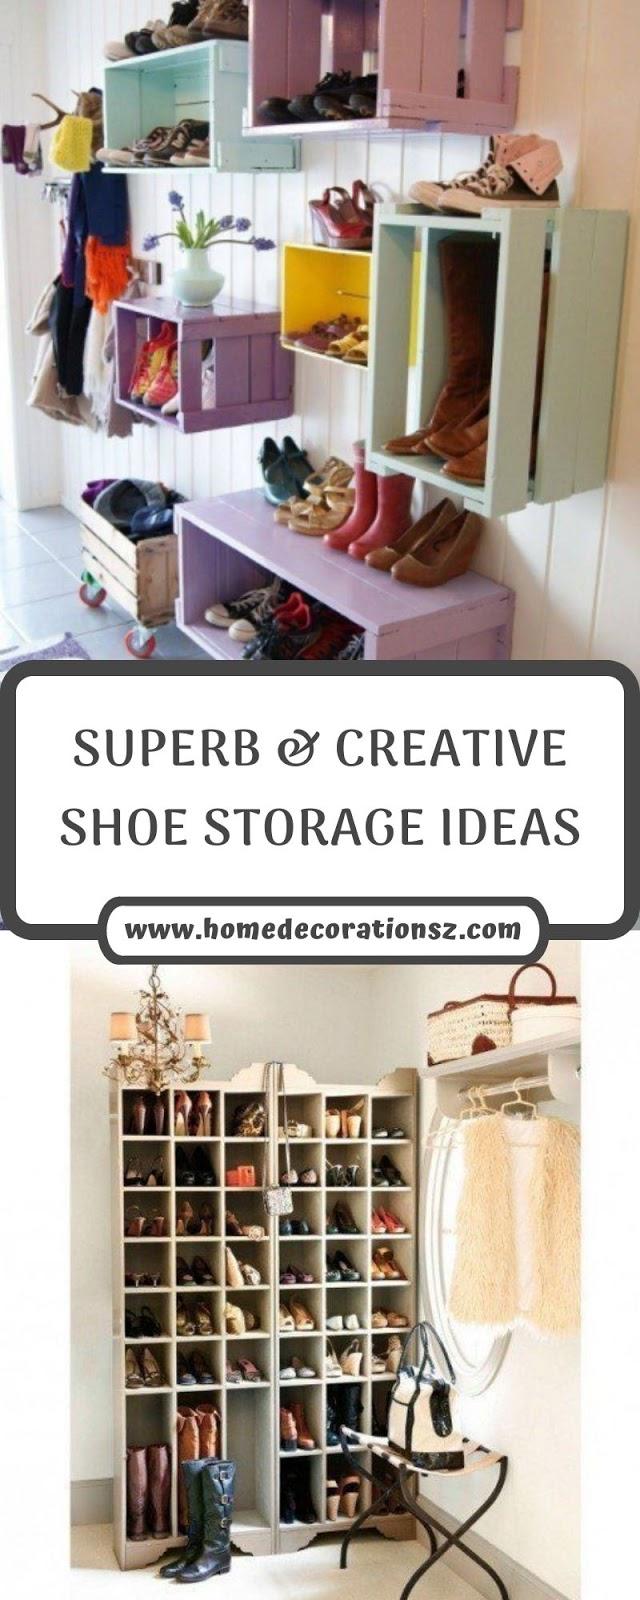 SUPERB & CREATIVE SHOE STORAGE IDEAS